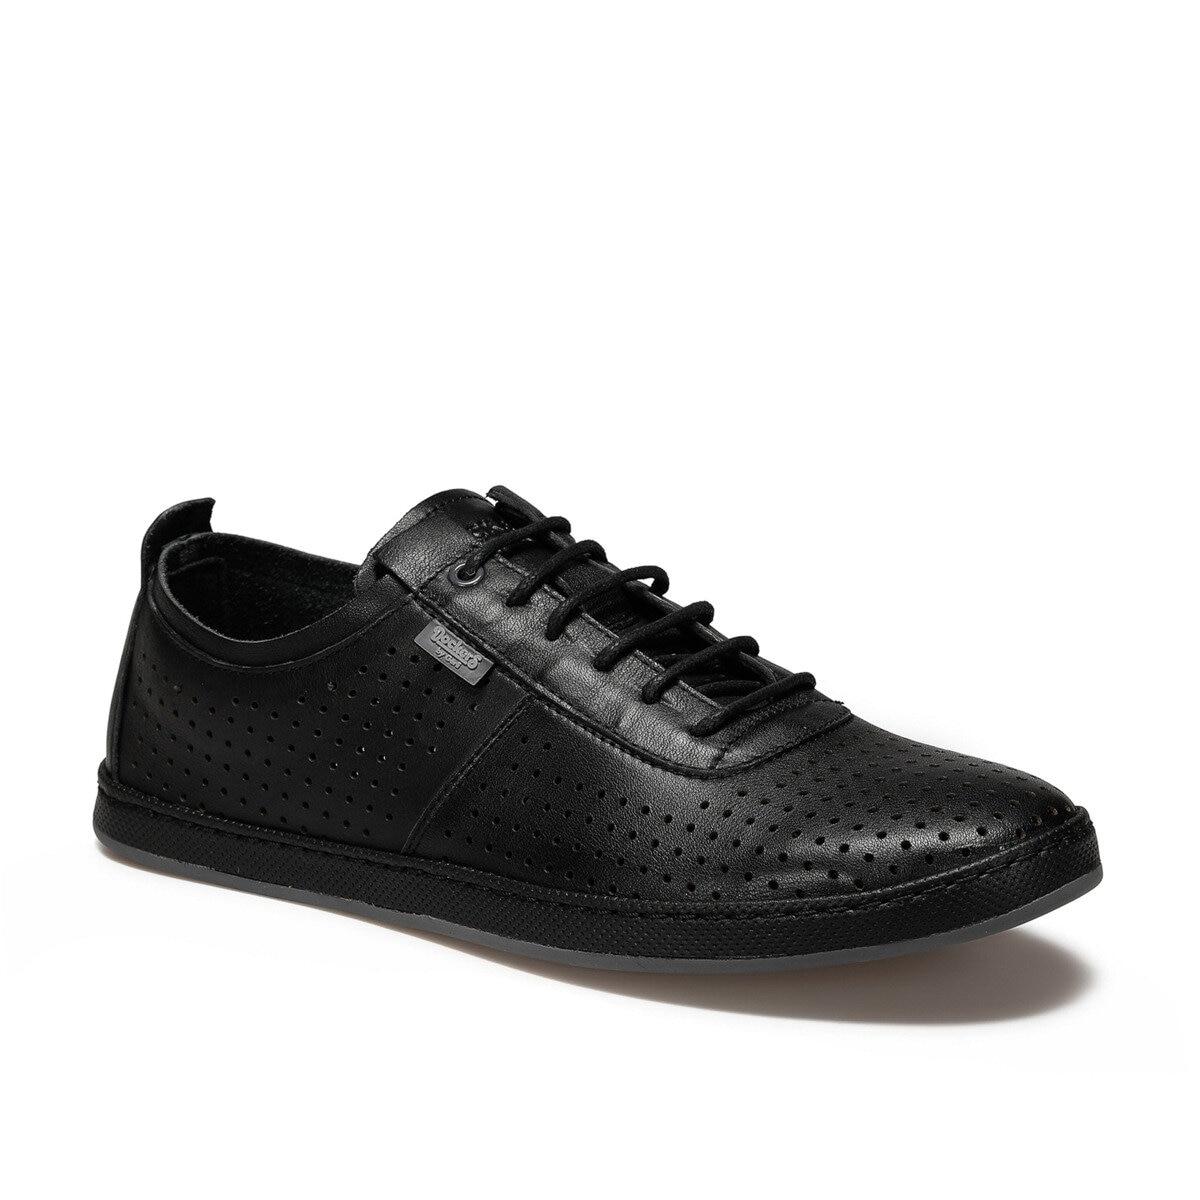 FLO 226201 Black Men 'S Comfort Shoes By Dockers The Gerle